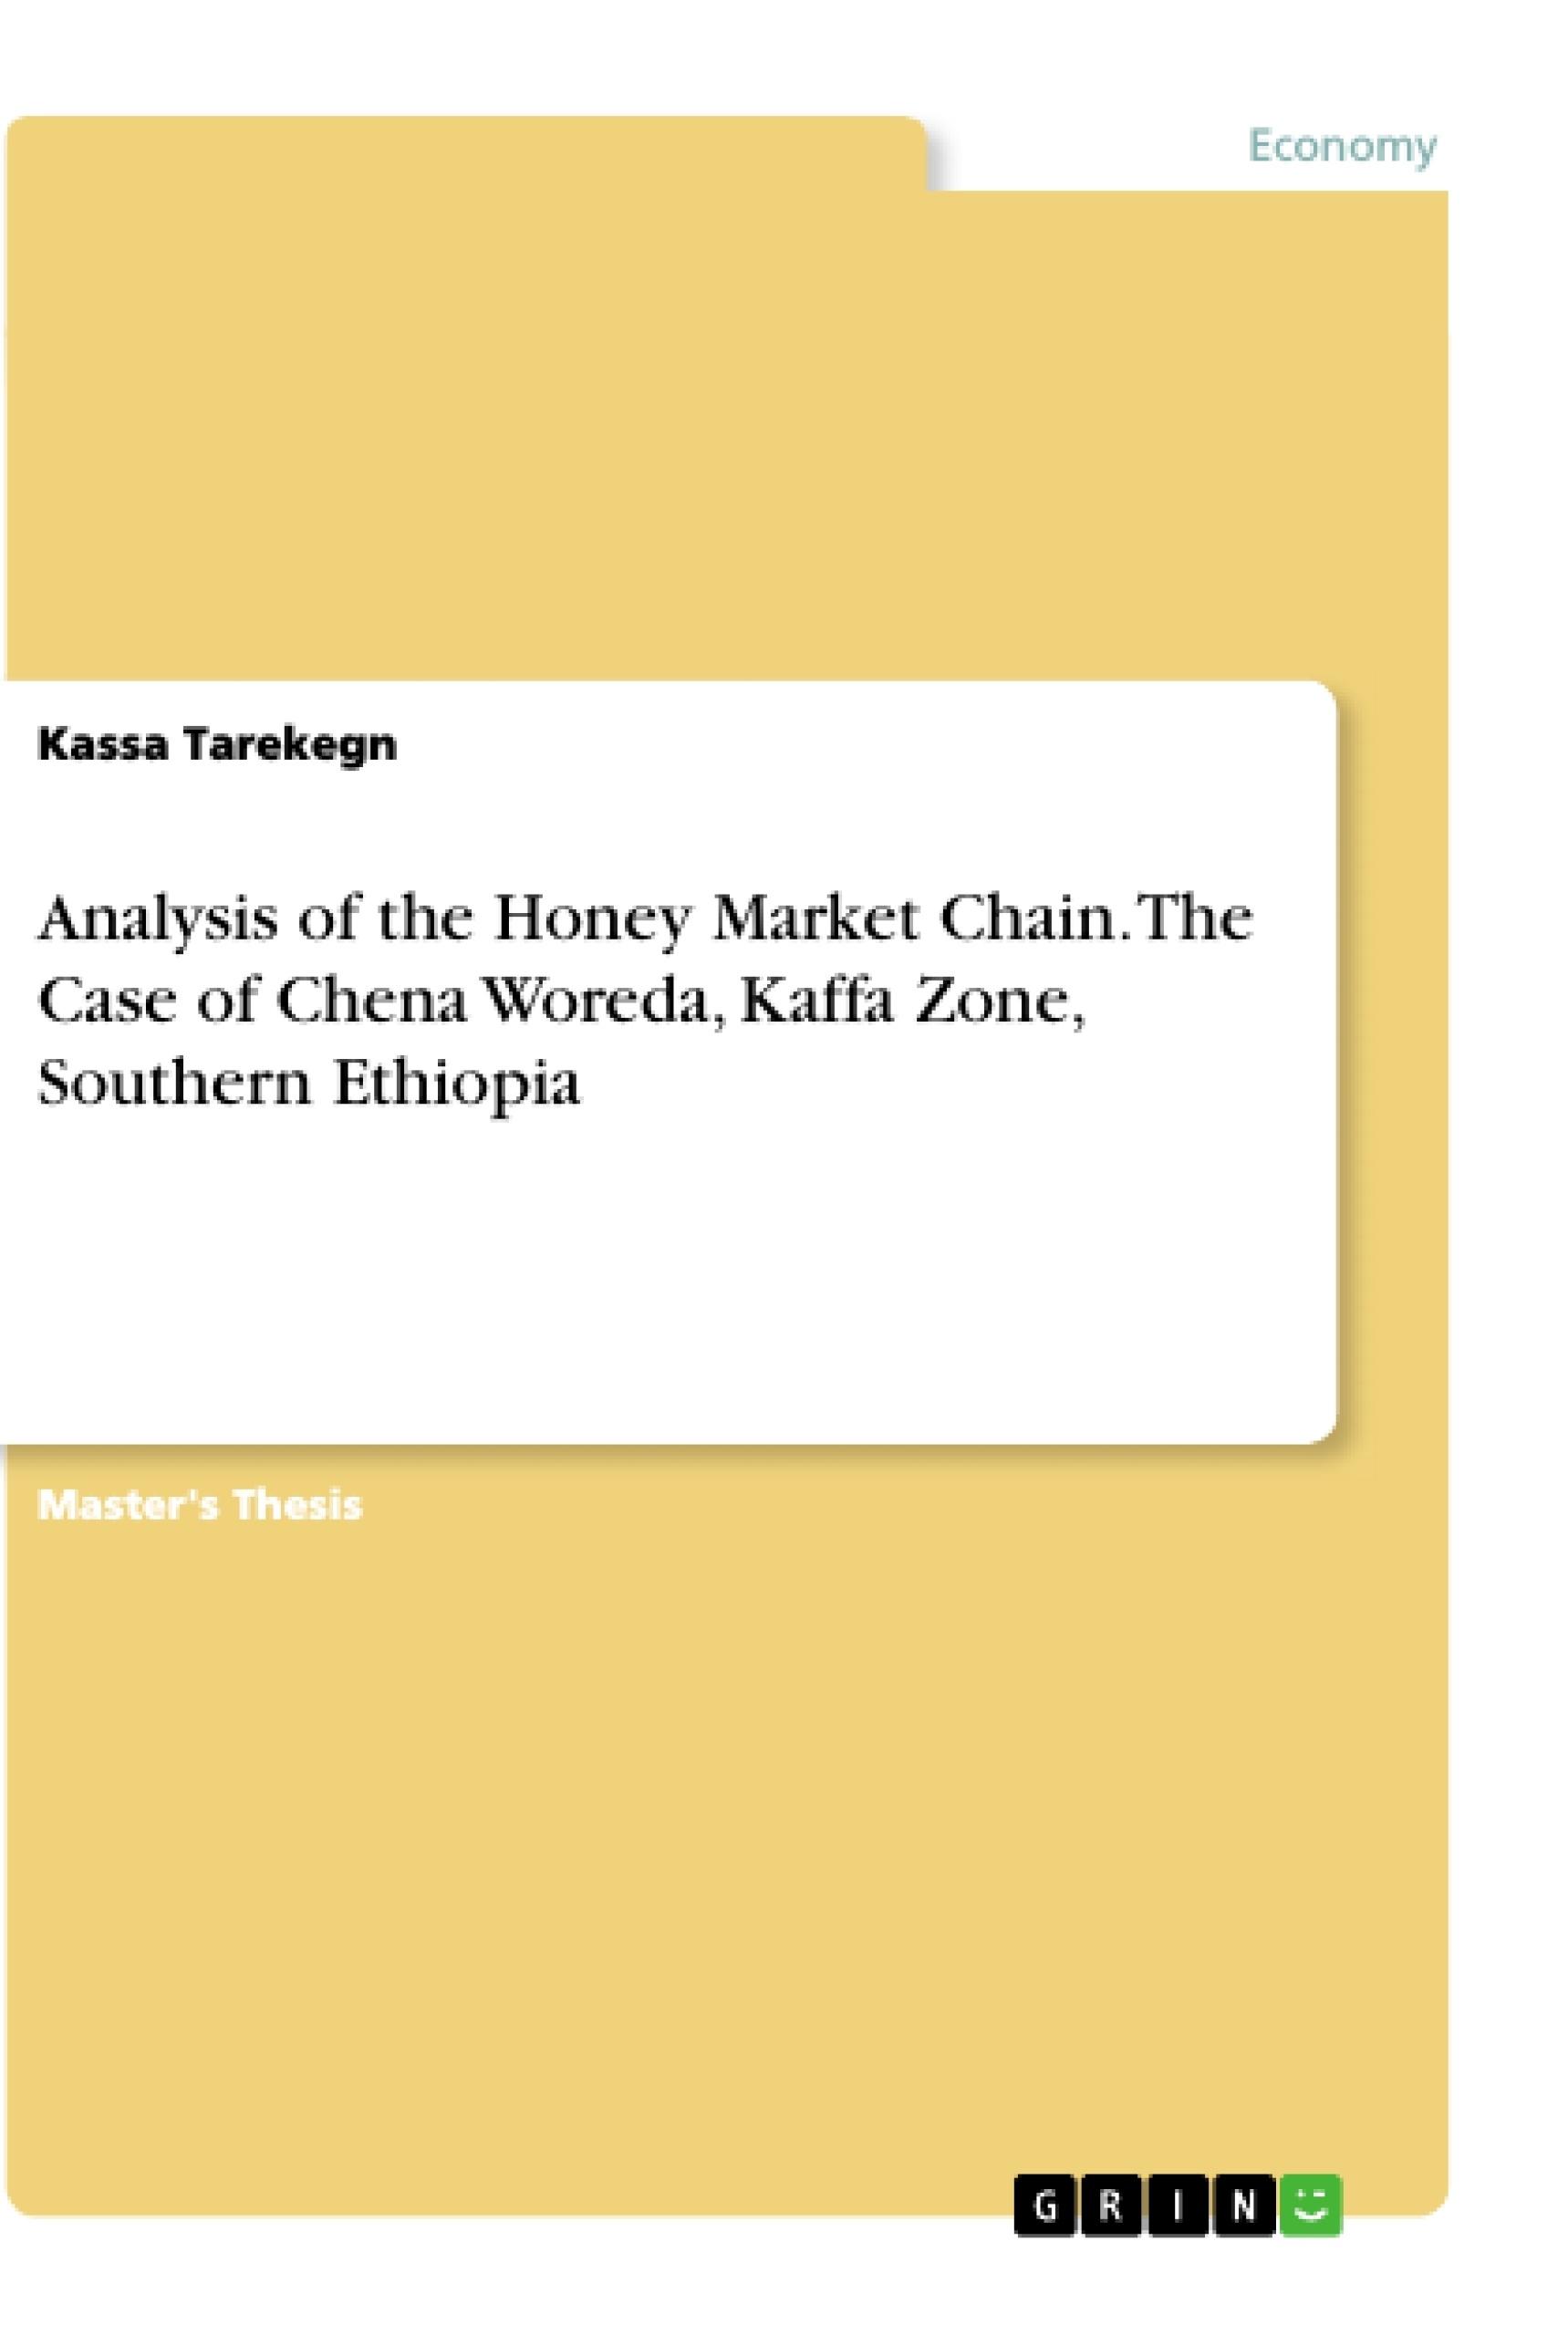 Title: Analysis of the Honey Market Chain. The Case of Chena Woreda, Kaffa Zone, Southern Ethiopia